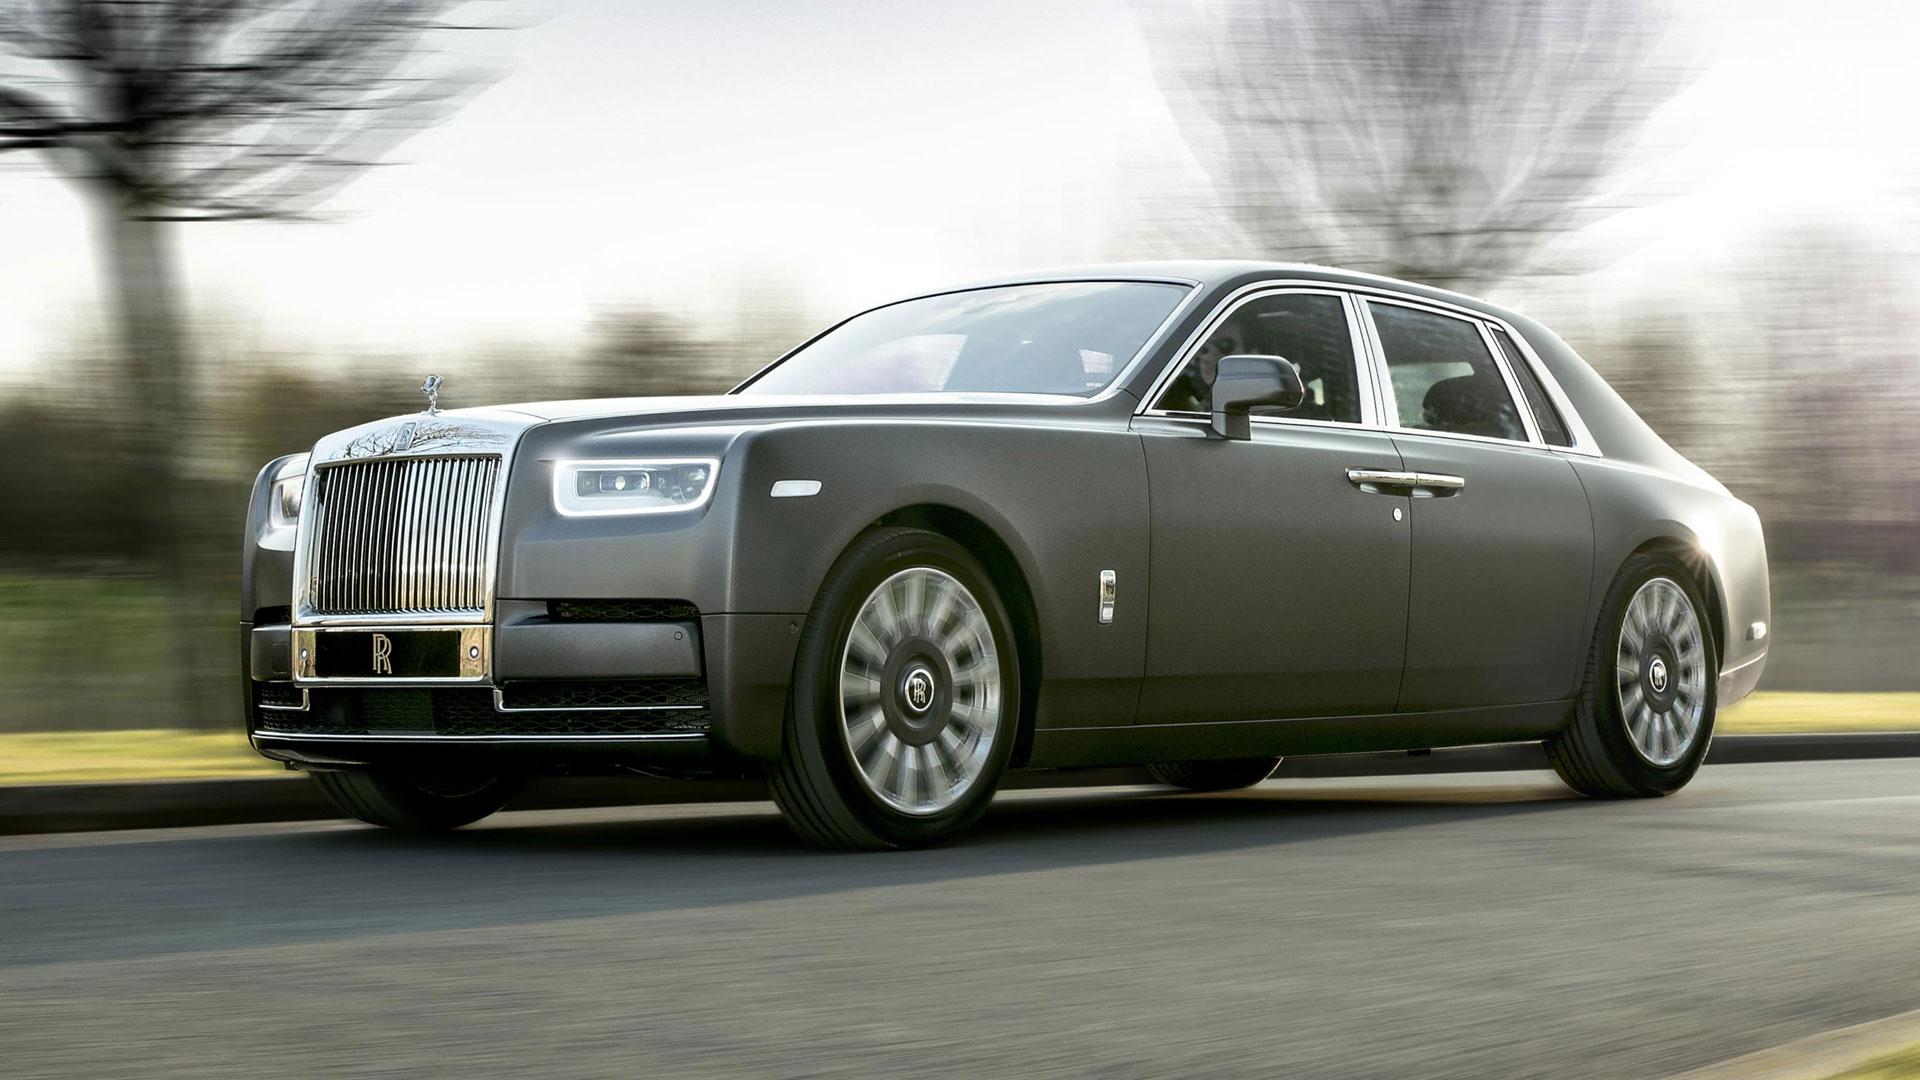 Rolls-Royce Phantom - greatest cars of the decade